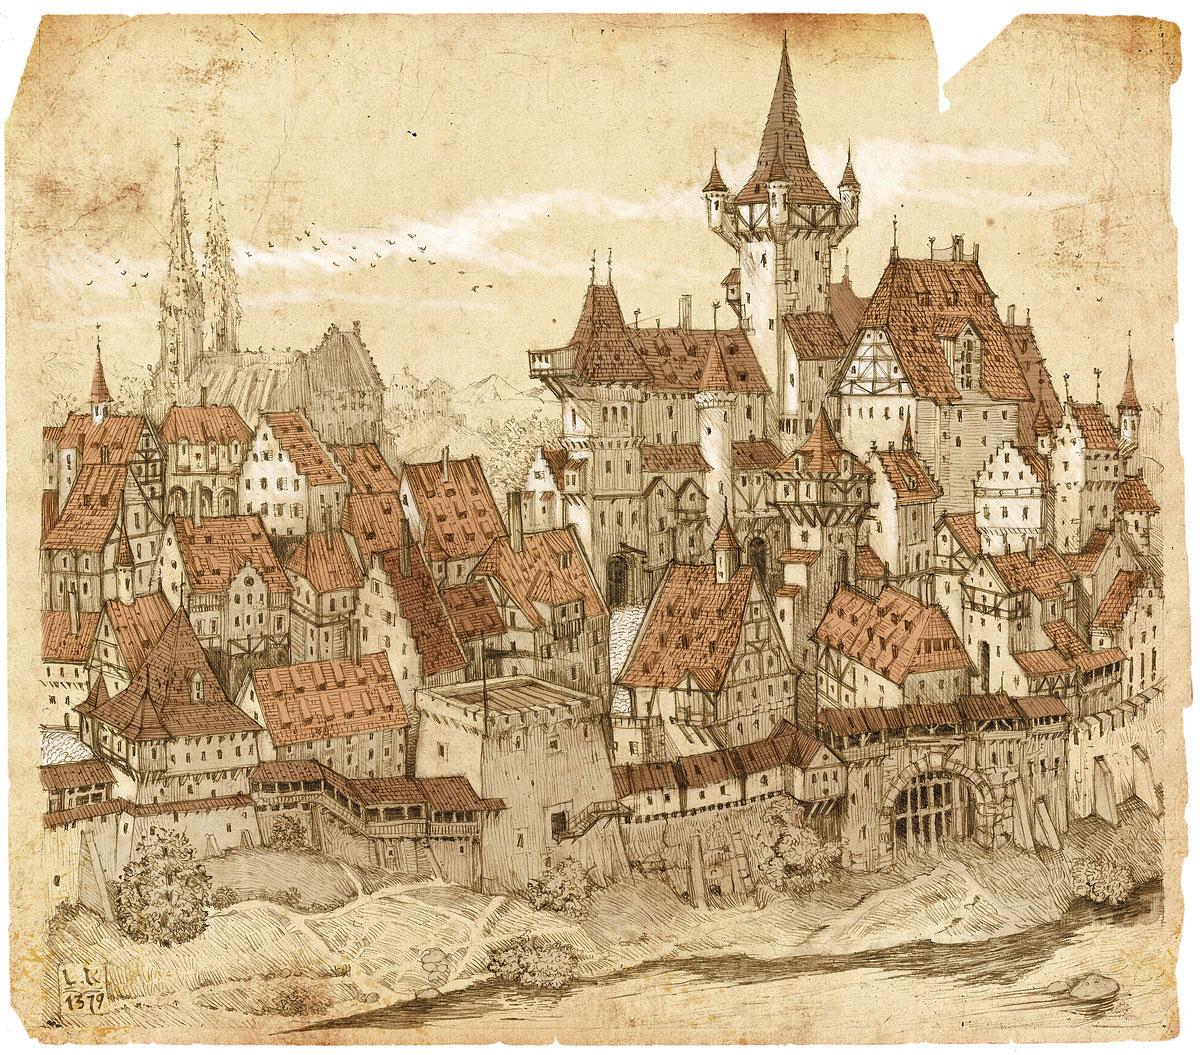 Back Cover Illustration for Medieval stories, Krone Verlag 2009